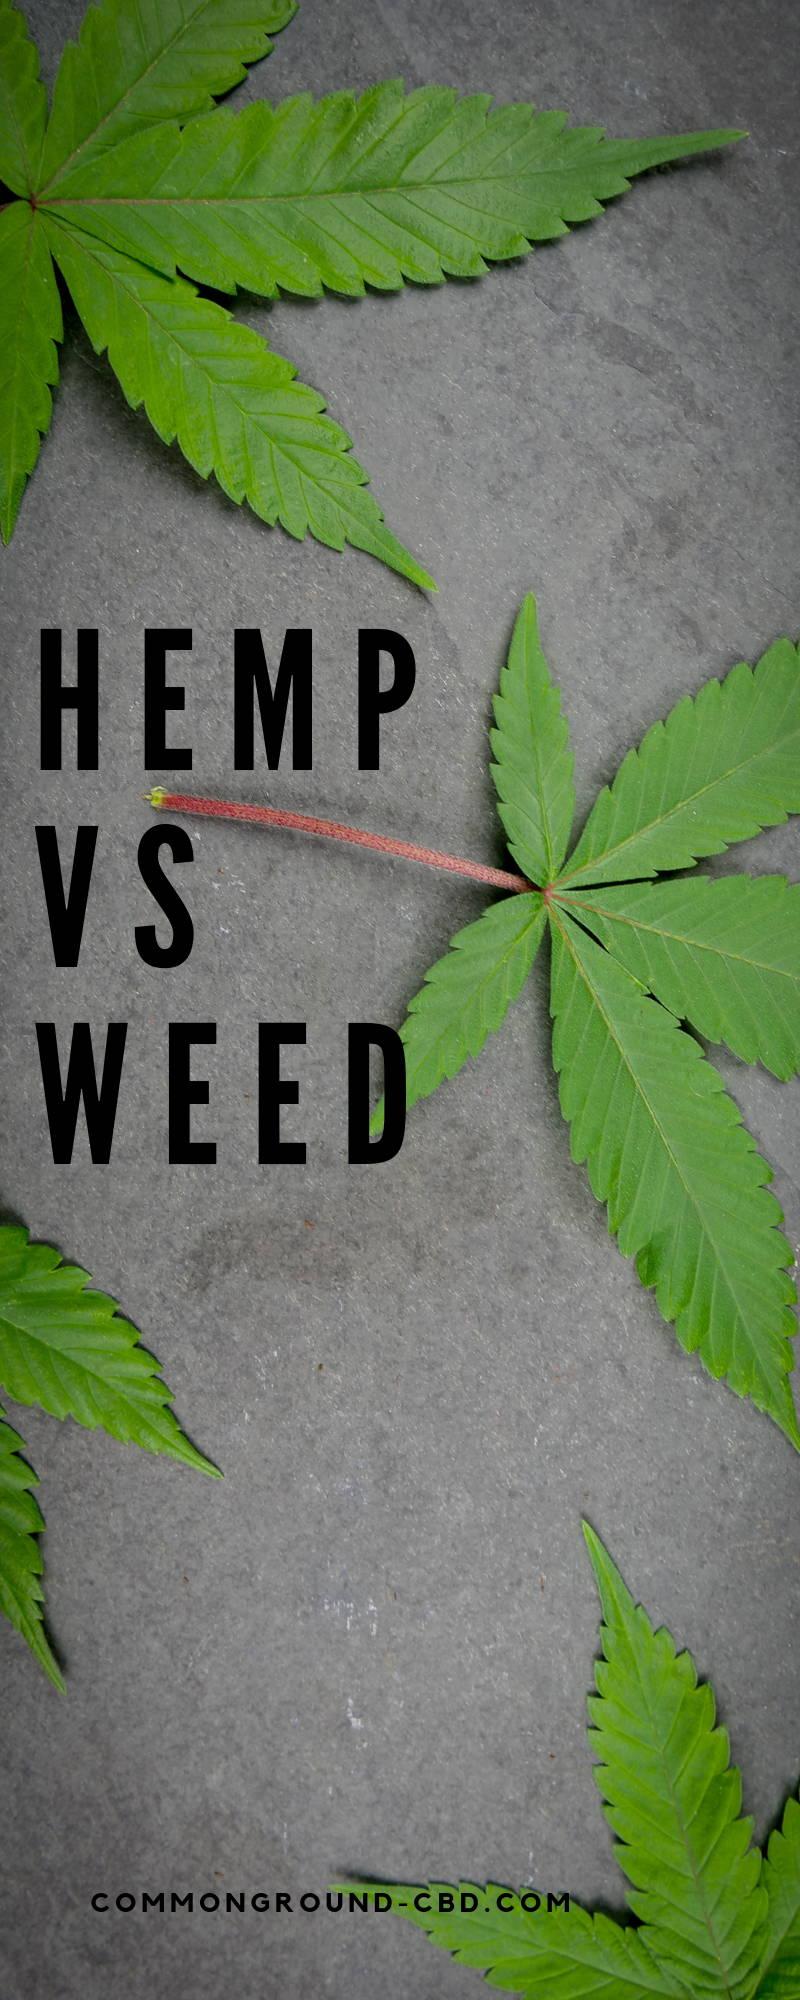 Hemp vs Weed